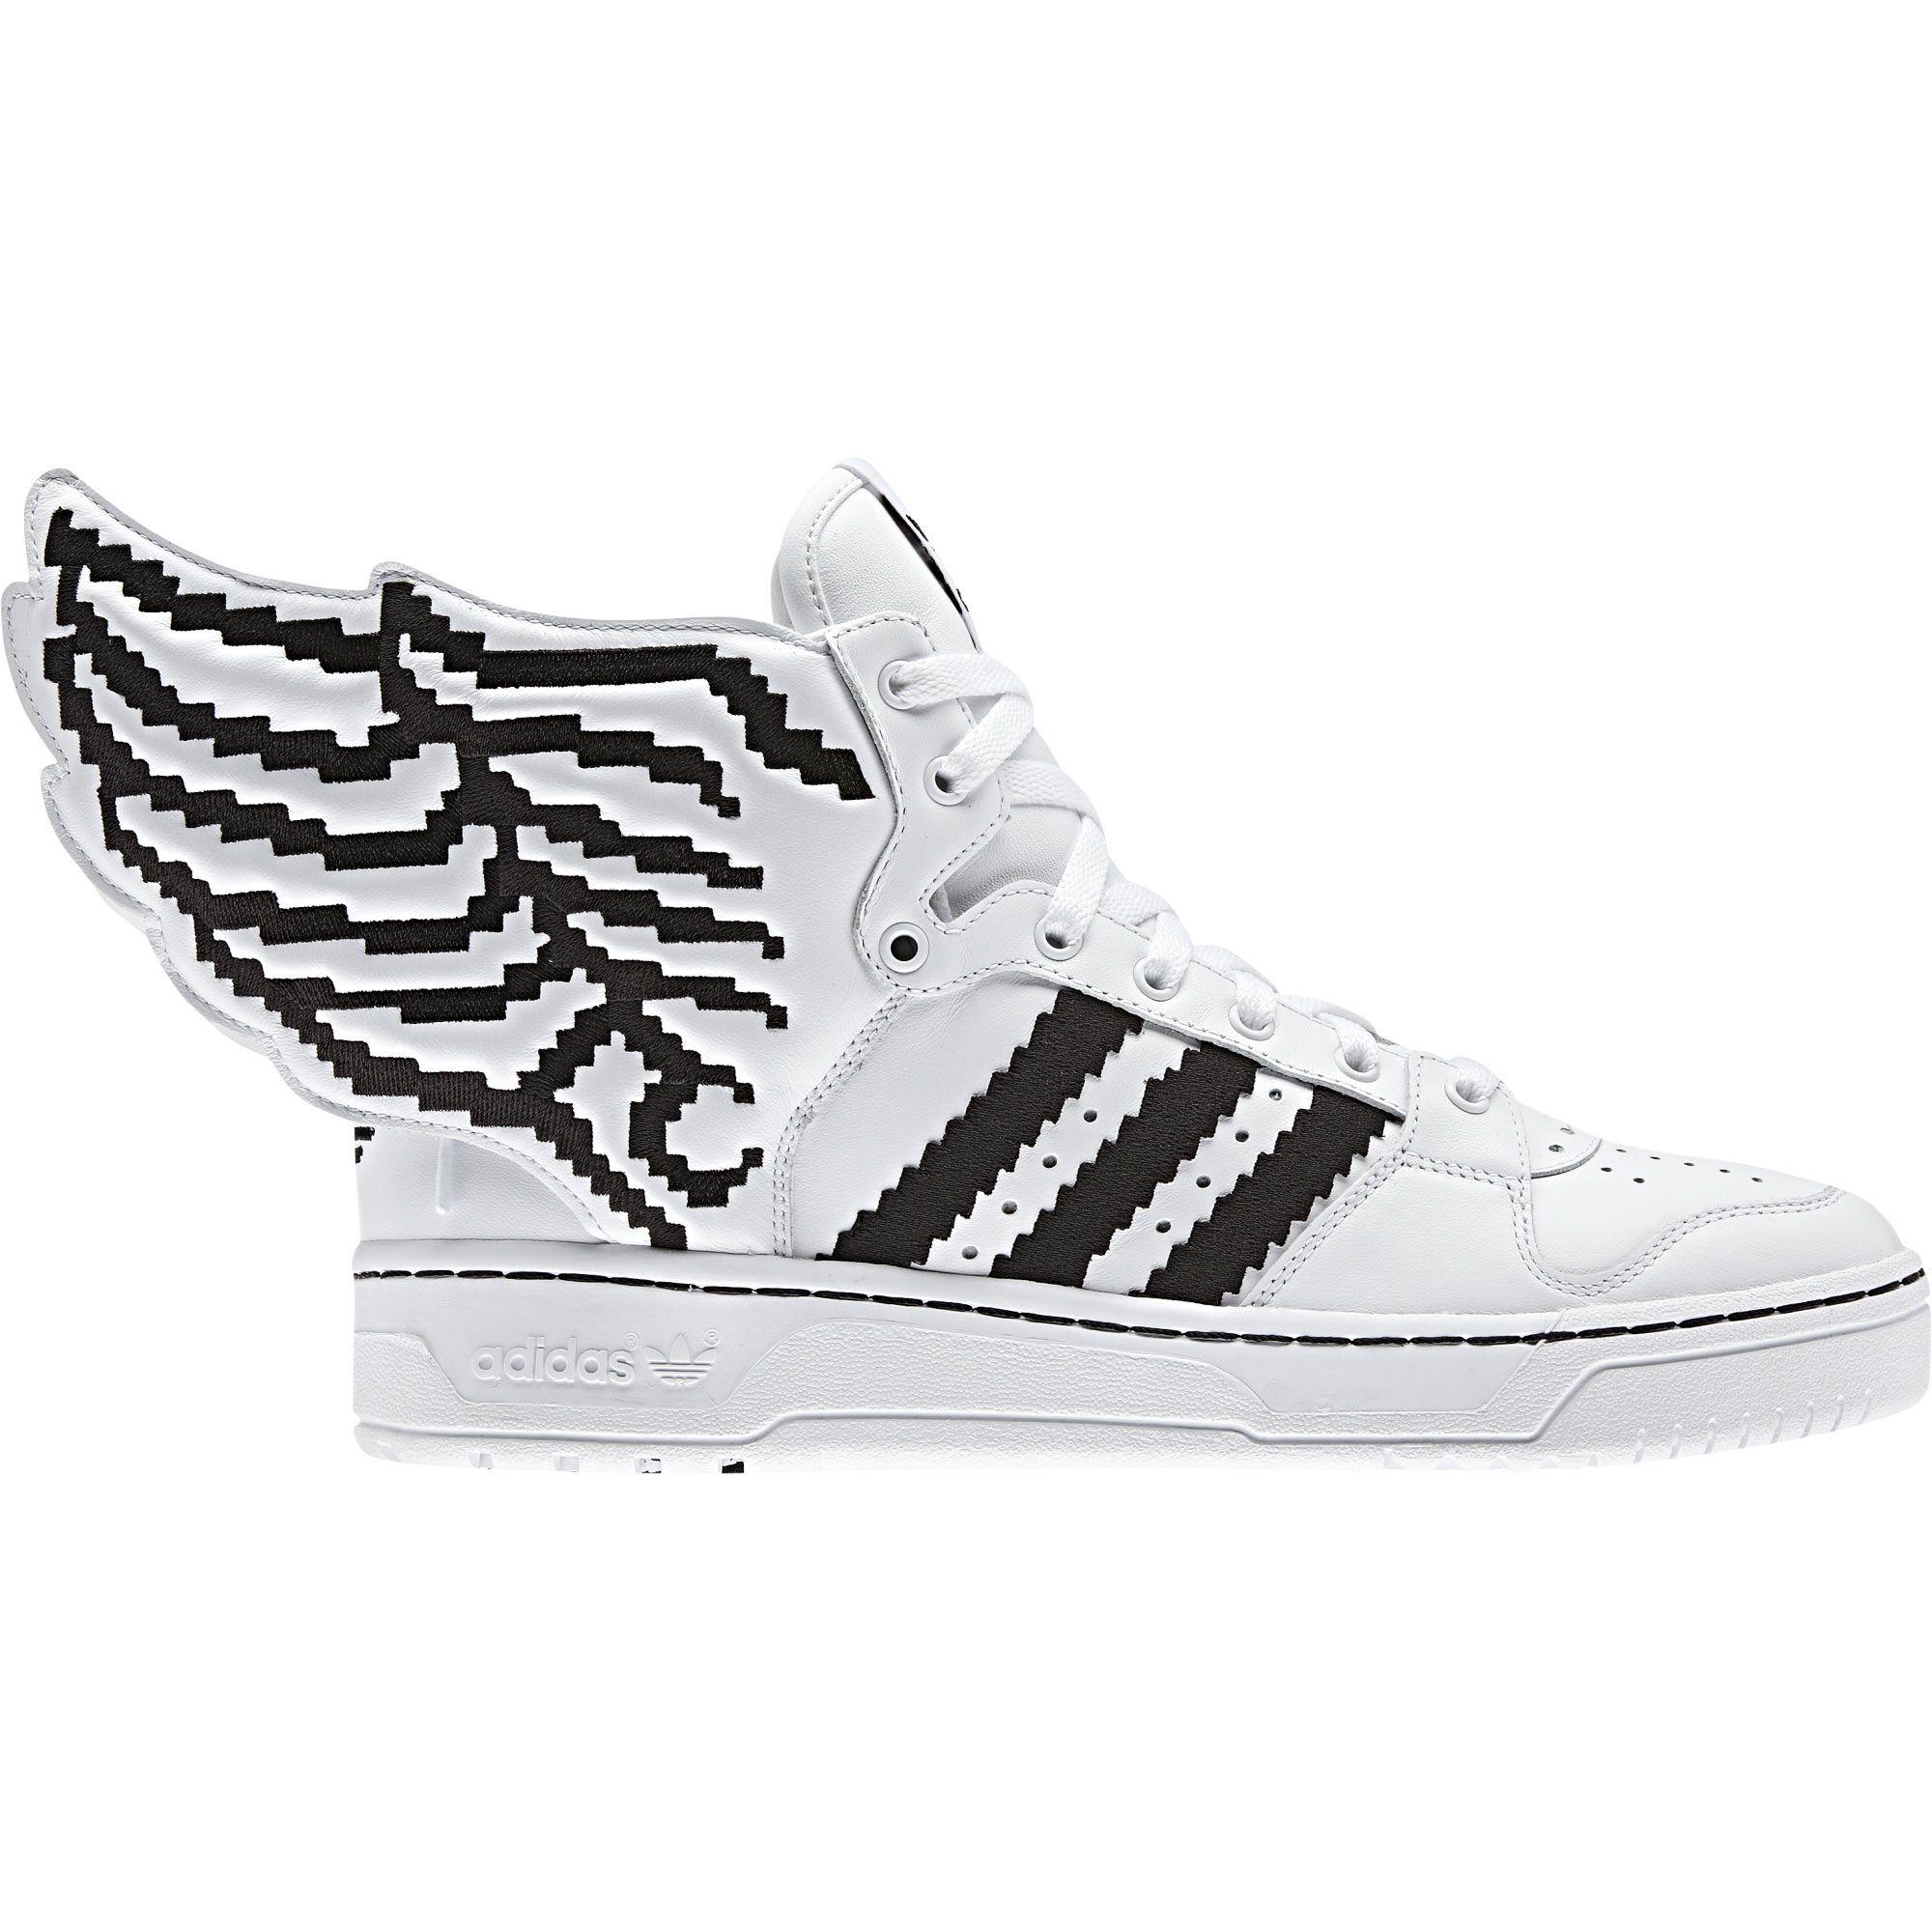 robot Madurar su  Adidas Wings 2.0 Pixel Shoes £160 | Adidas, Adidas official ...